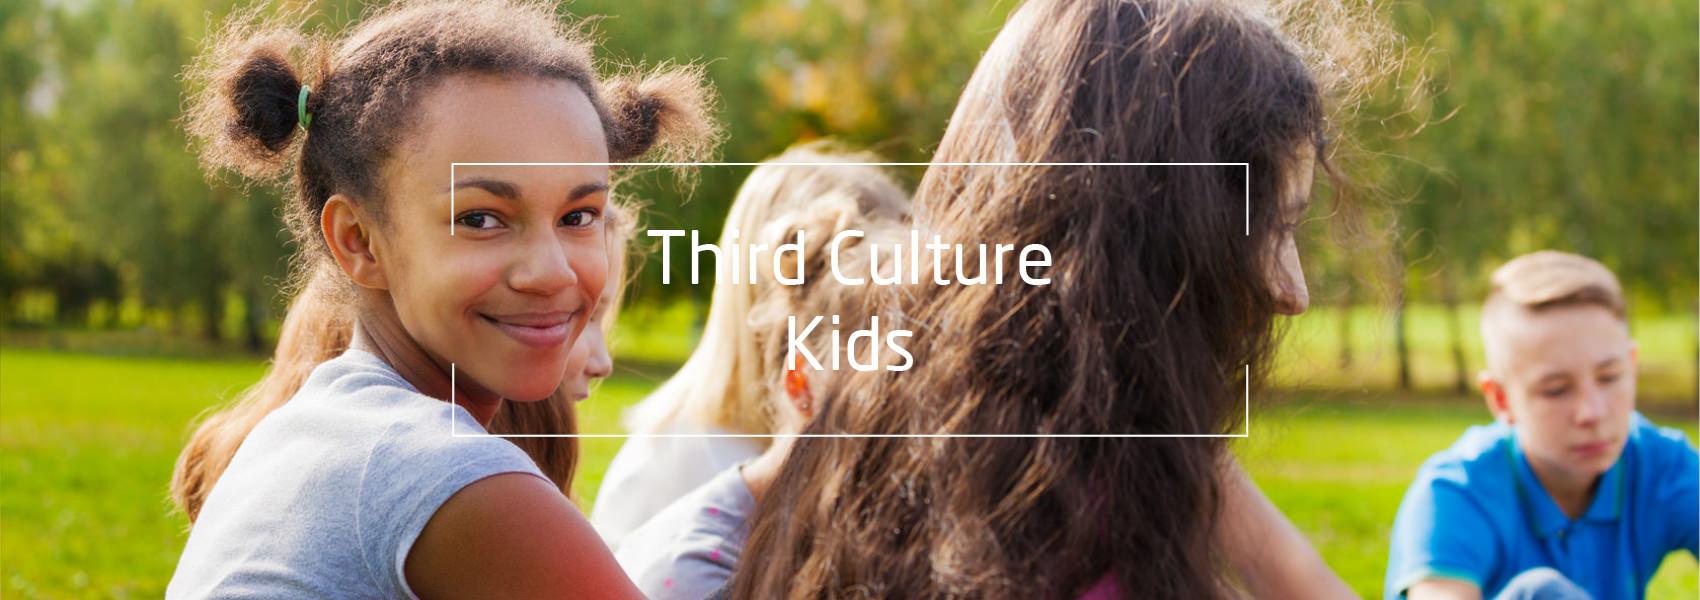 lachendes Mädchen, Text: Third Culture Kids